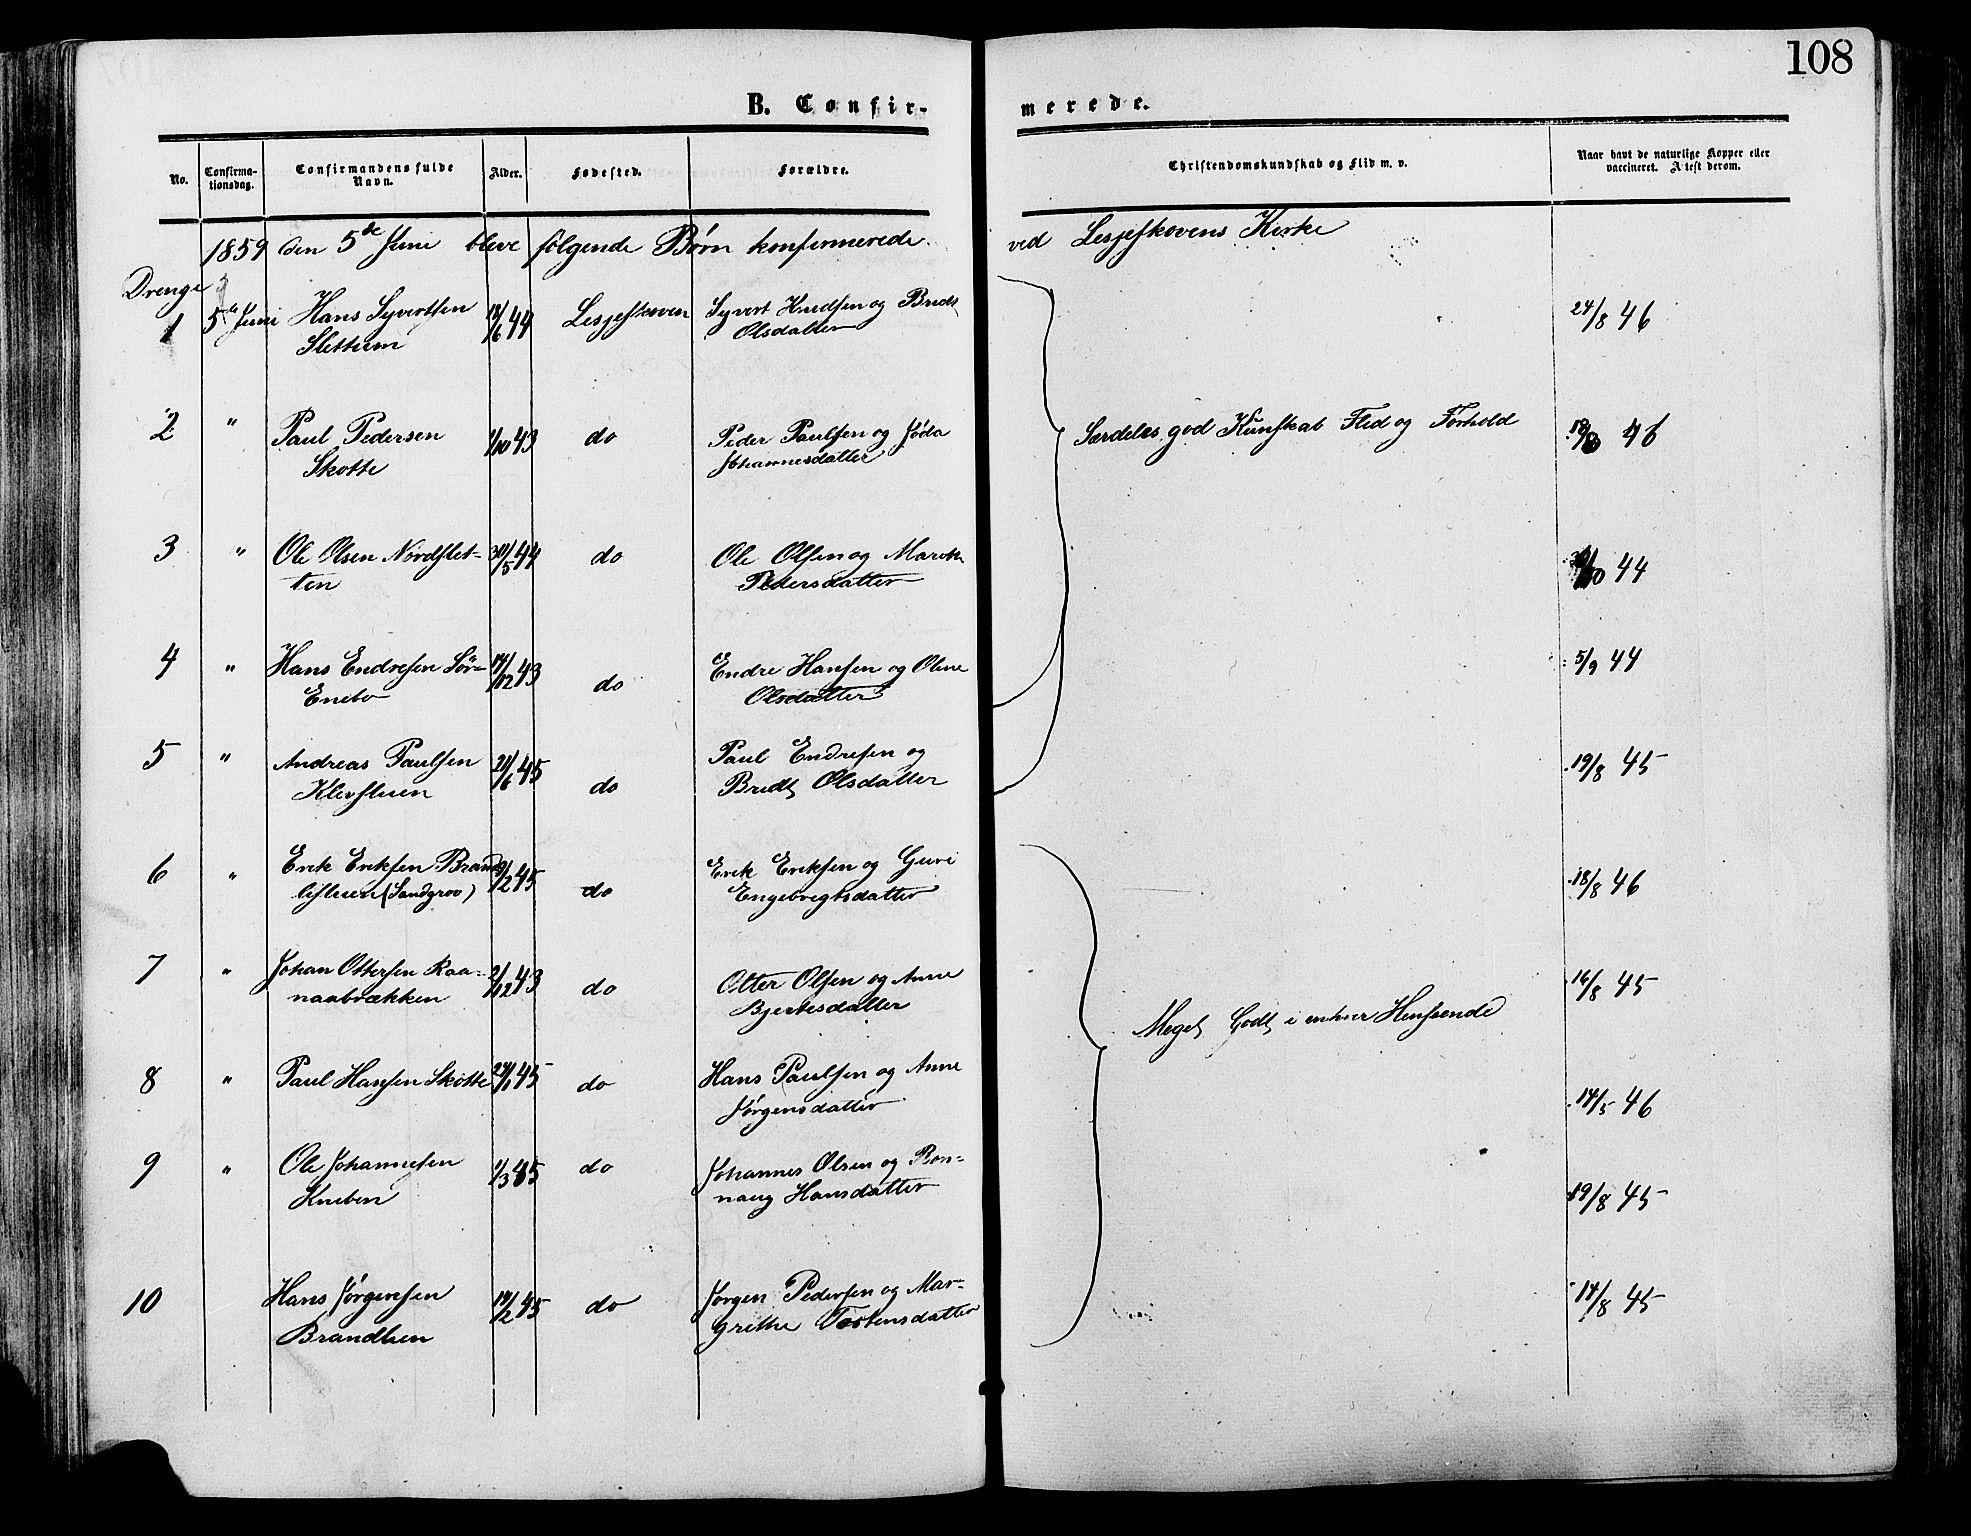 SAH, Lesja prestekontor, Ministerialbok nr. 9, 1854-1889, s. 108